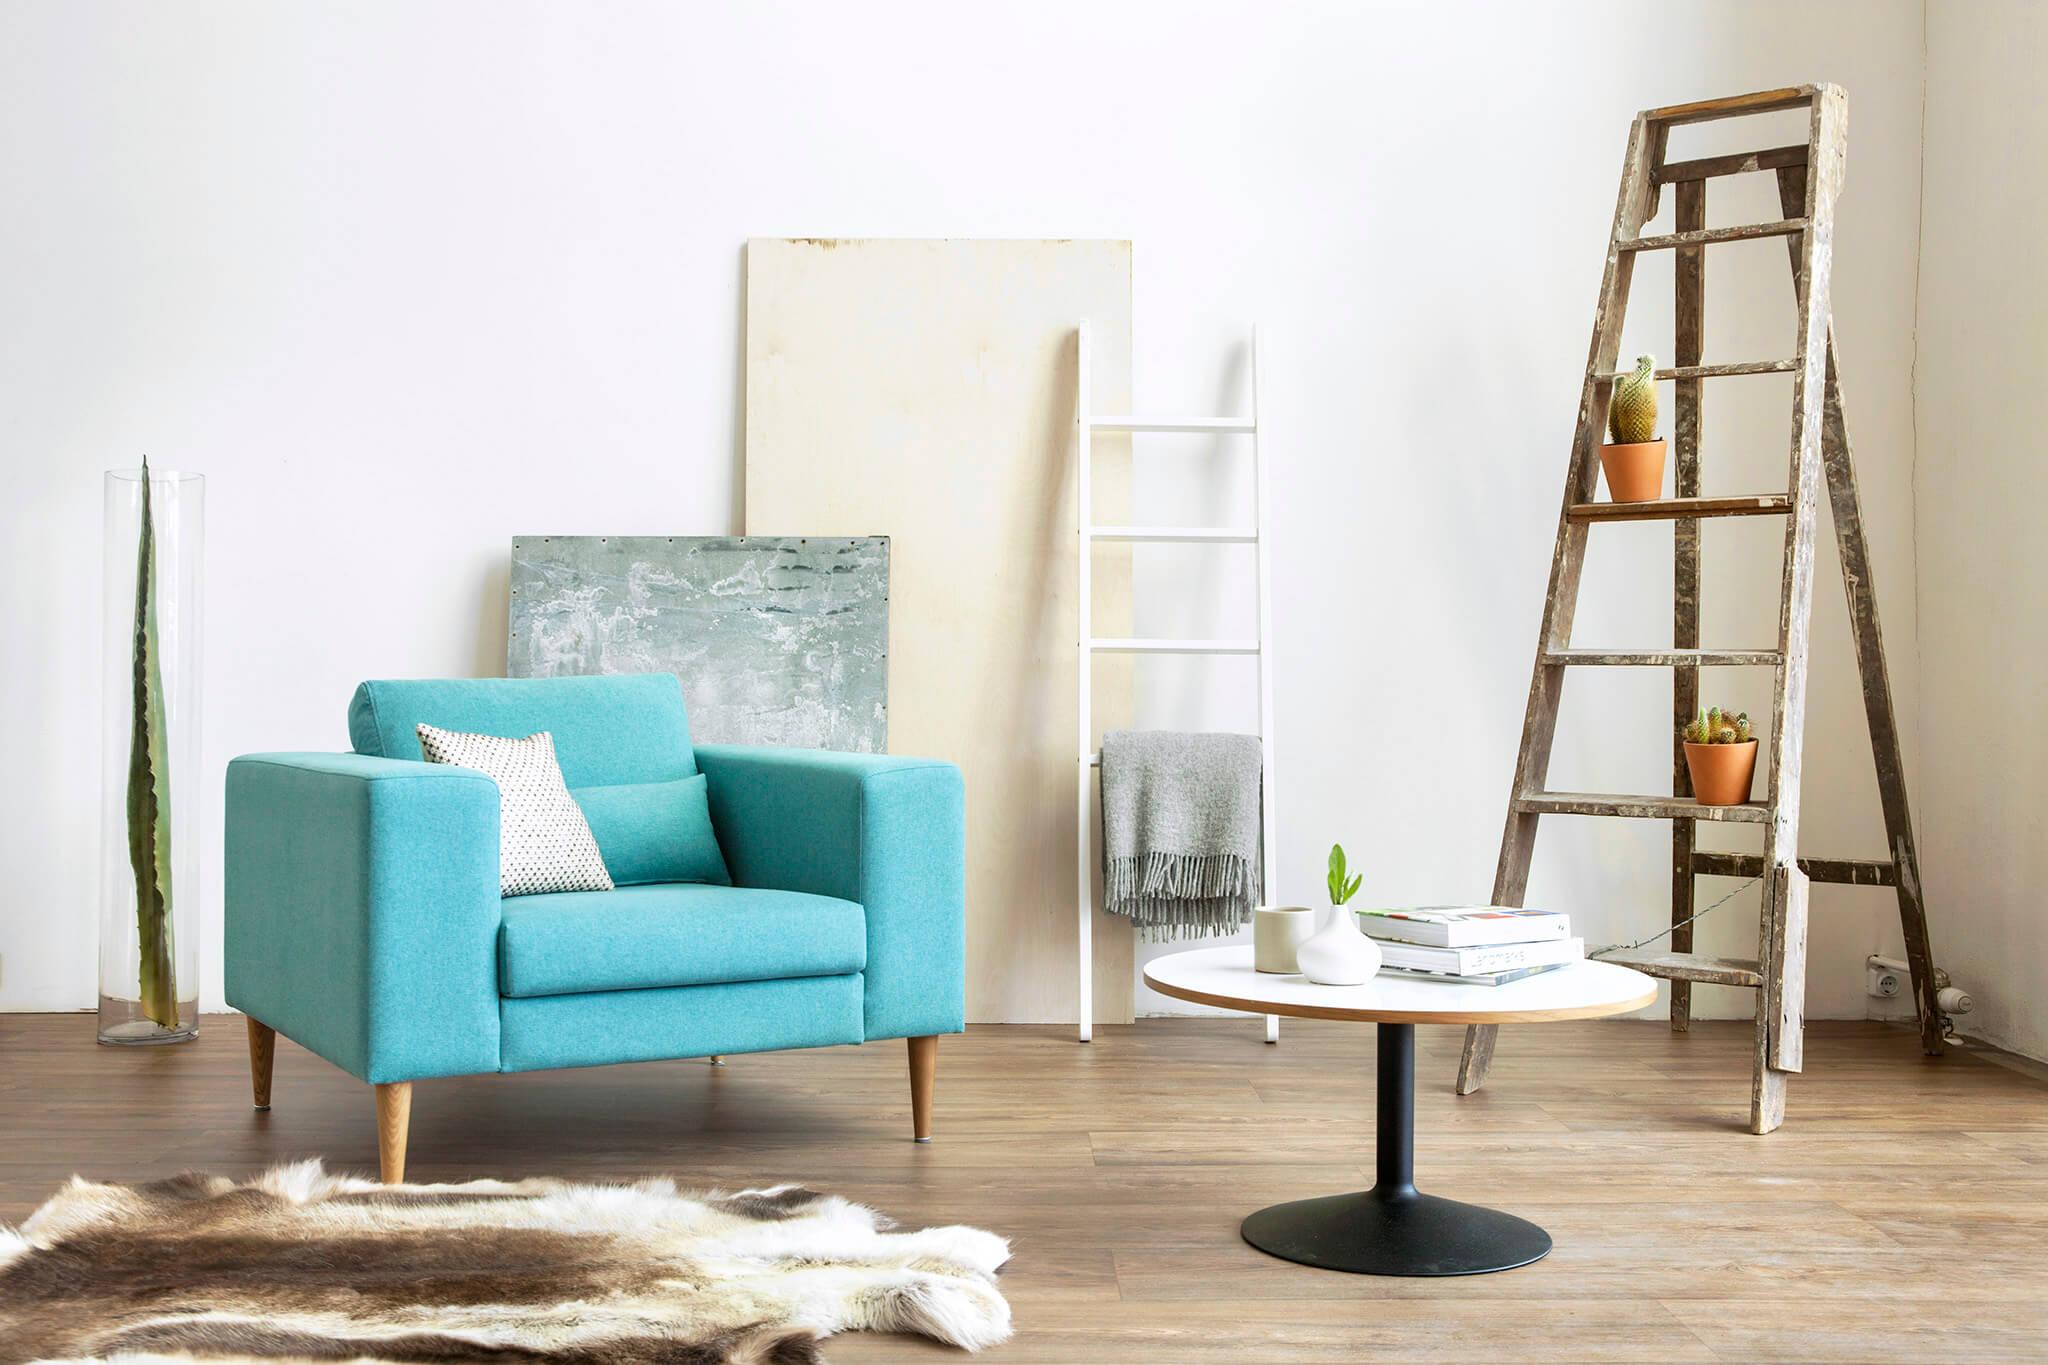 OOT-OOT_Studio-Frend-Armchair(1)